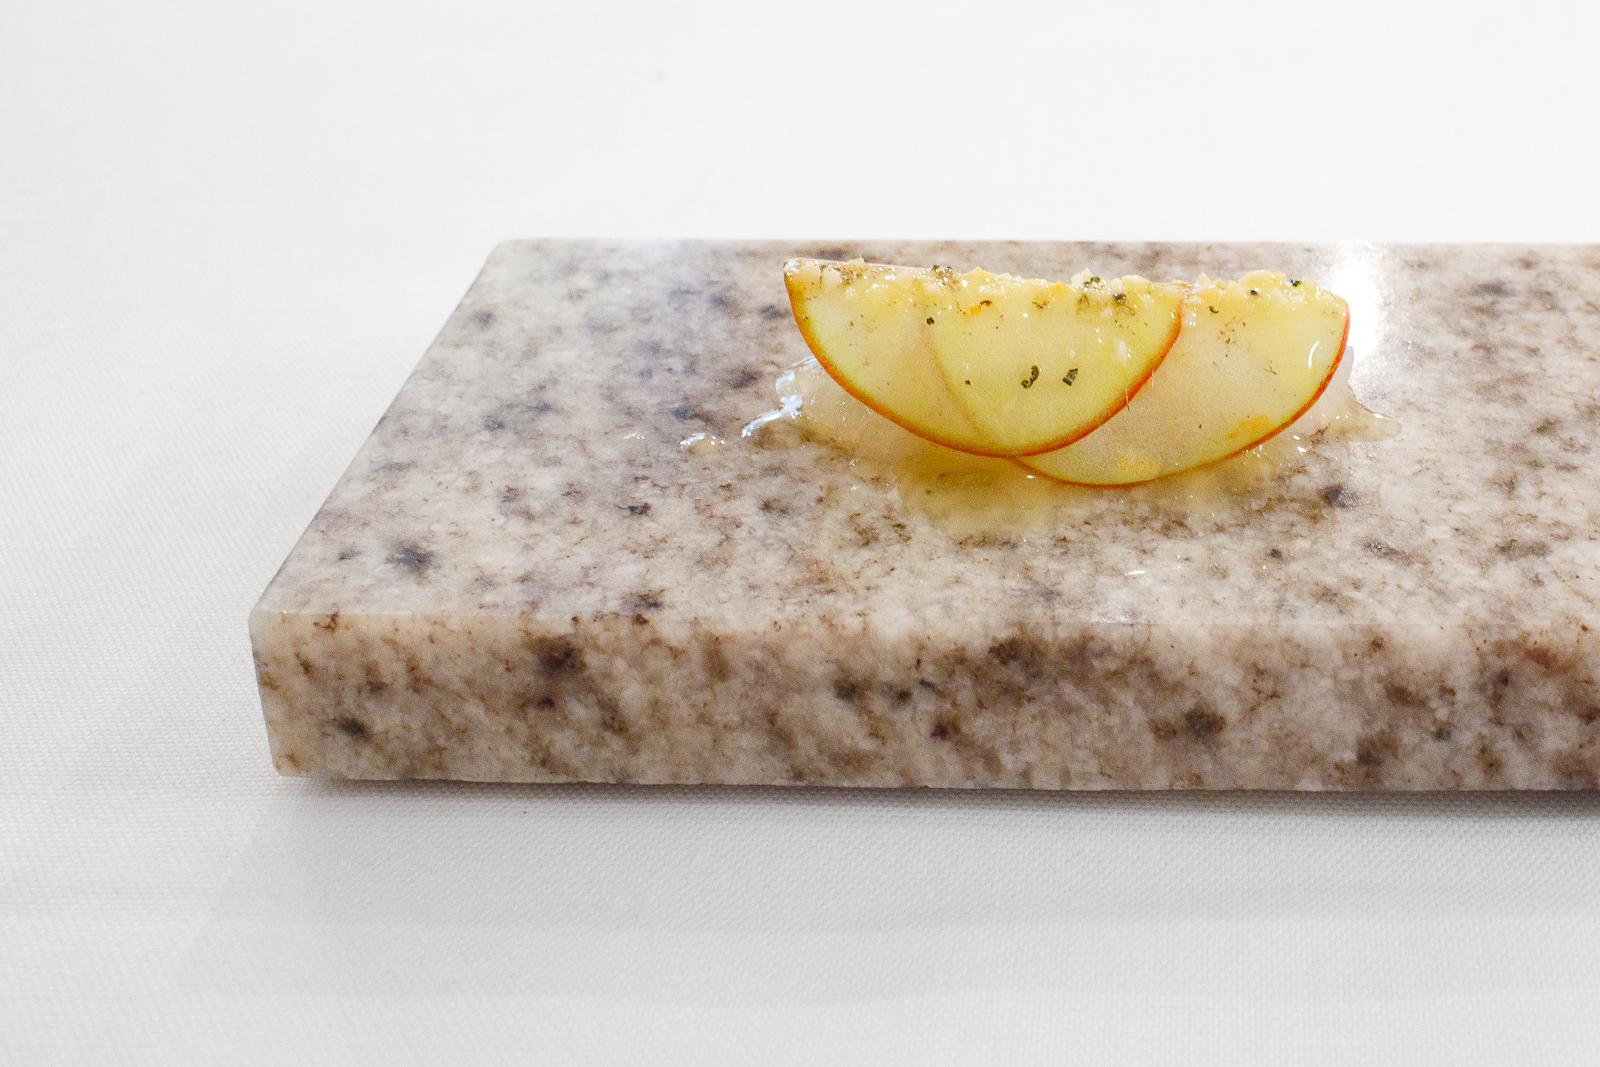 Amuse Bouche: Roughly chopped raw langoustine from Ingemar Johansson under autumn apple shavings, rosemary, and almonds.